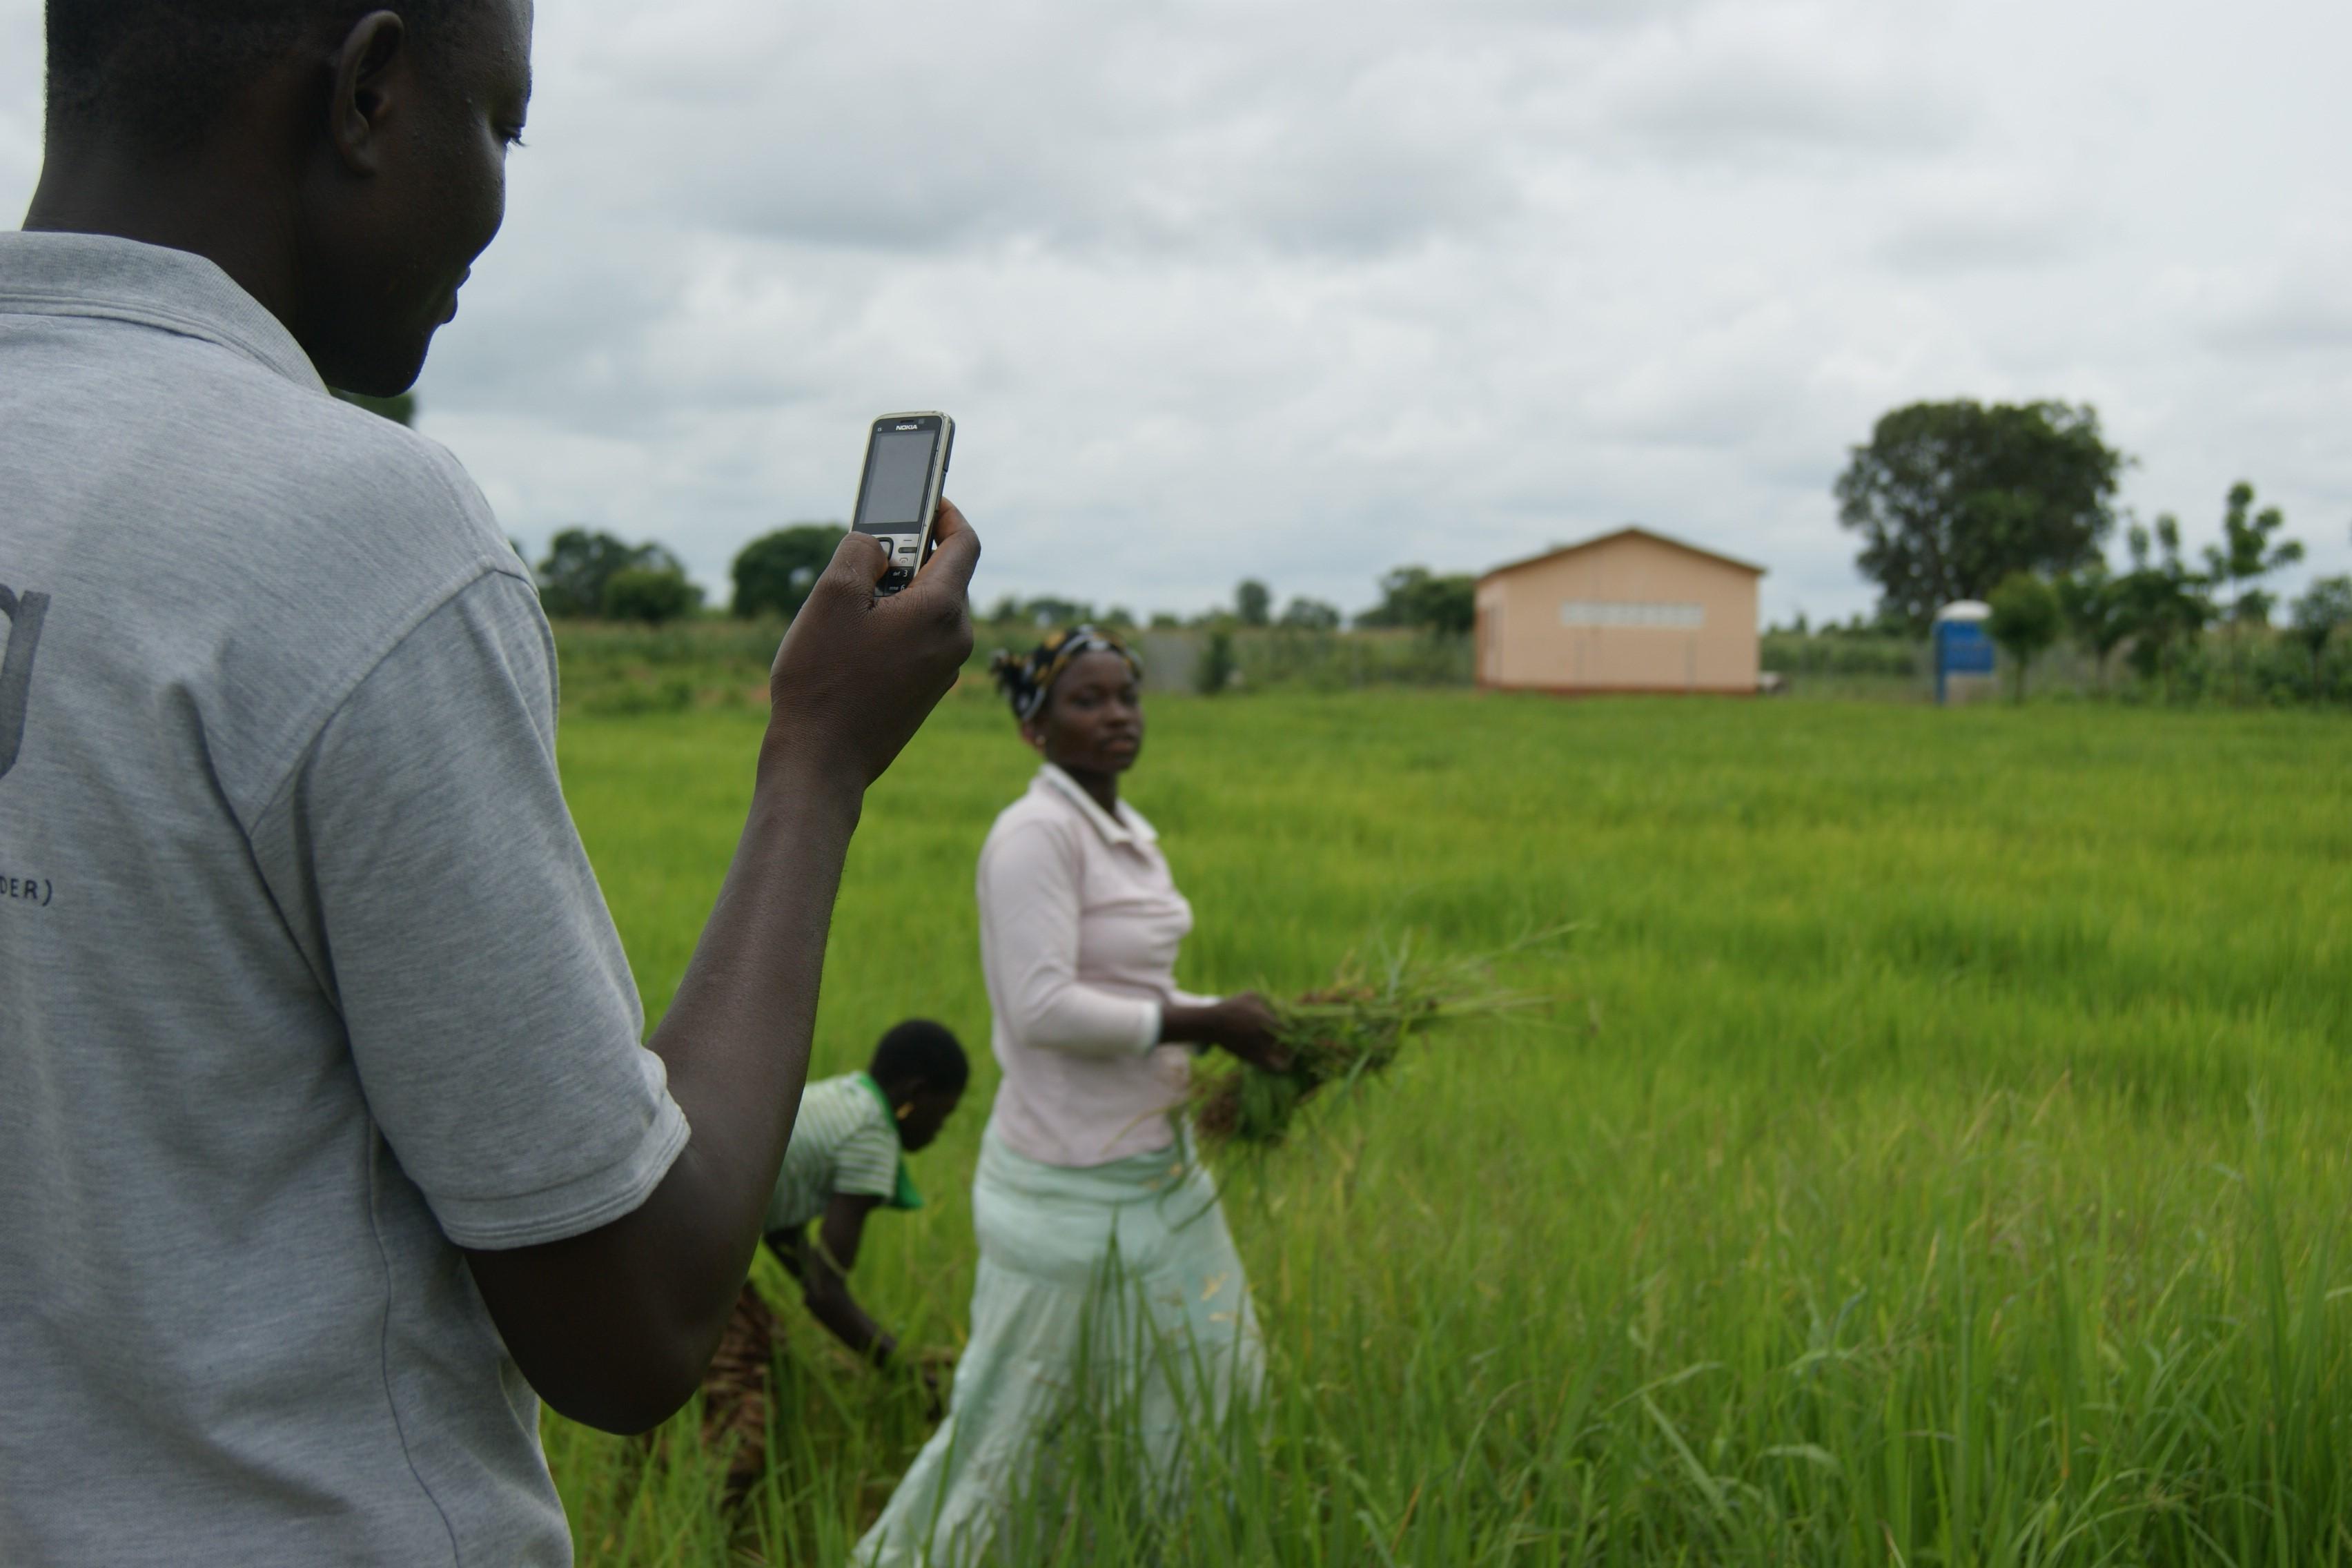 "Résultat de recherche d'images pour ""african electronic, africa, iphone, data center, mobile, africa"""